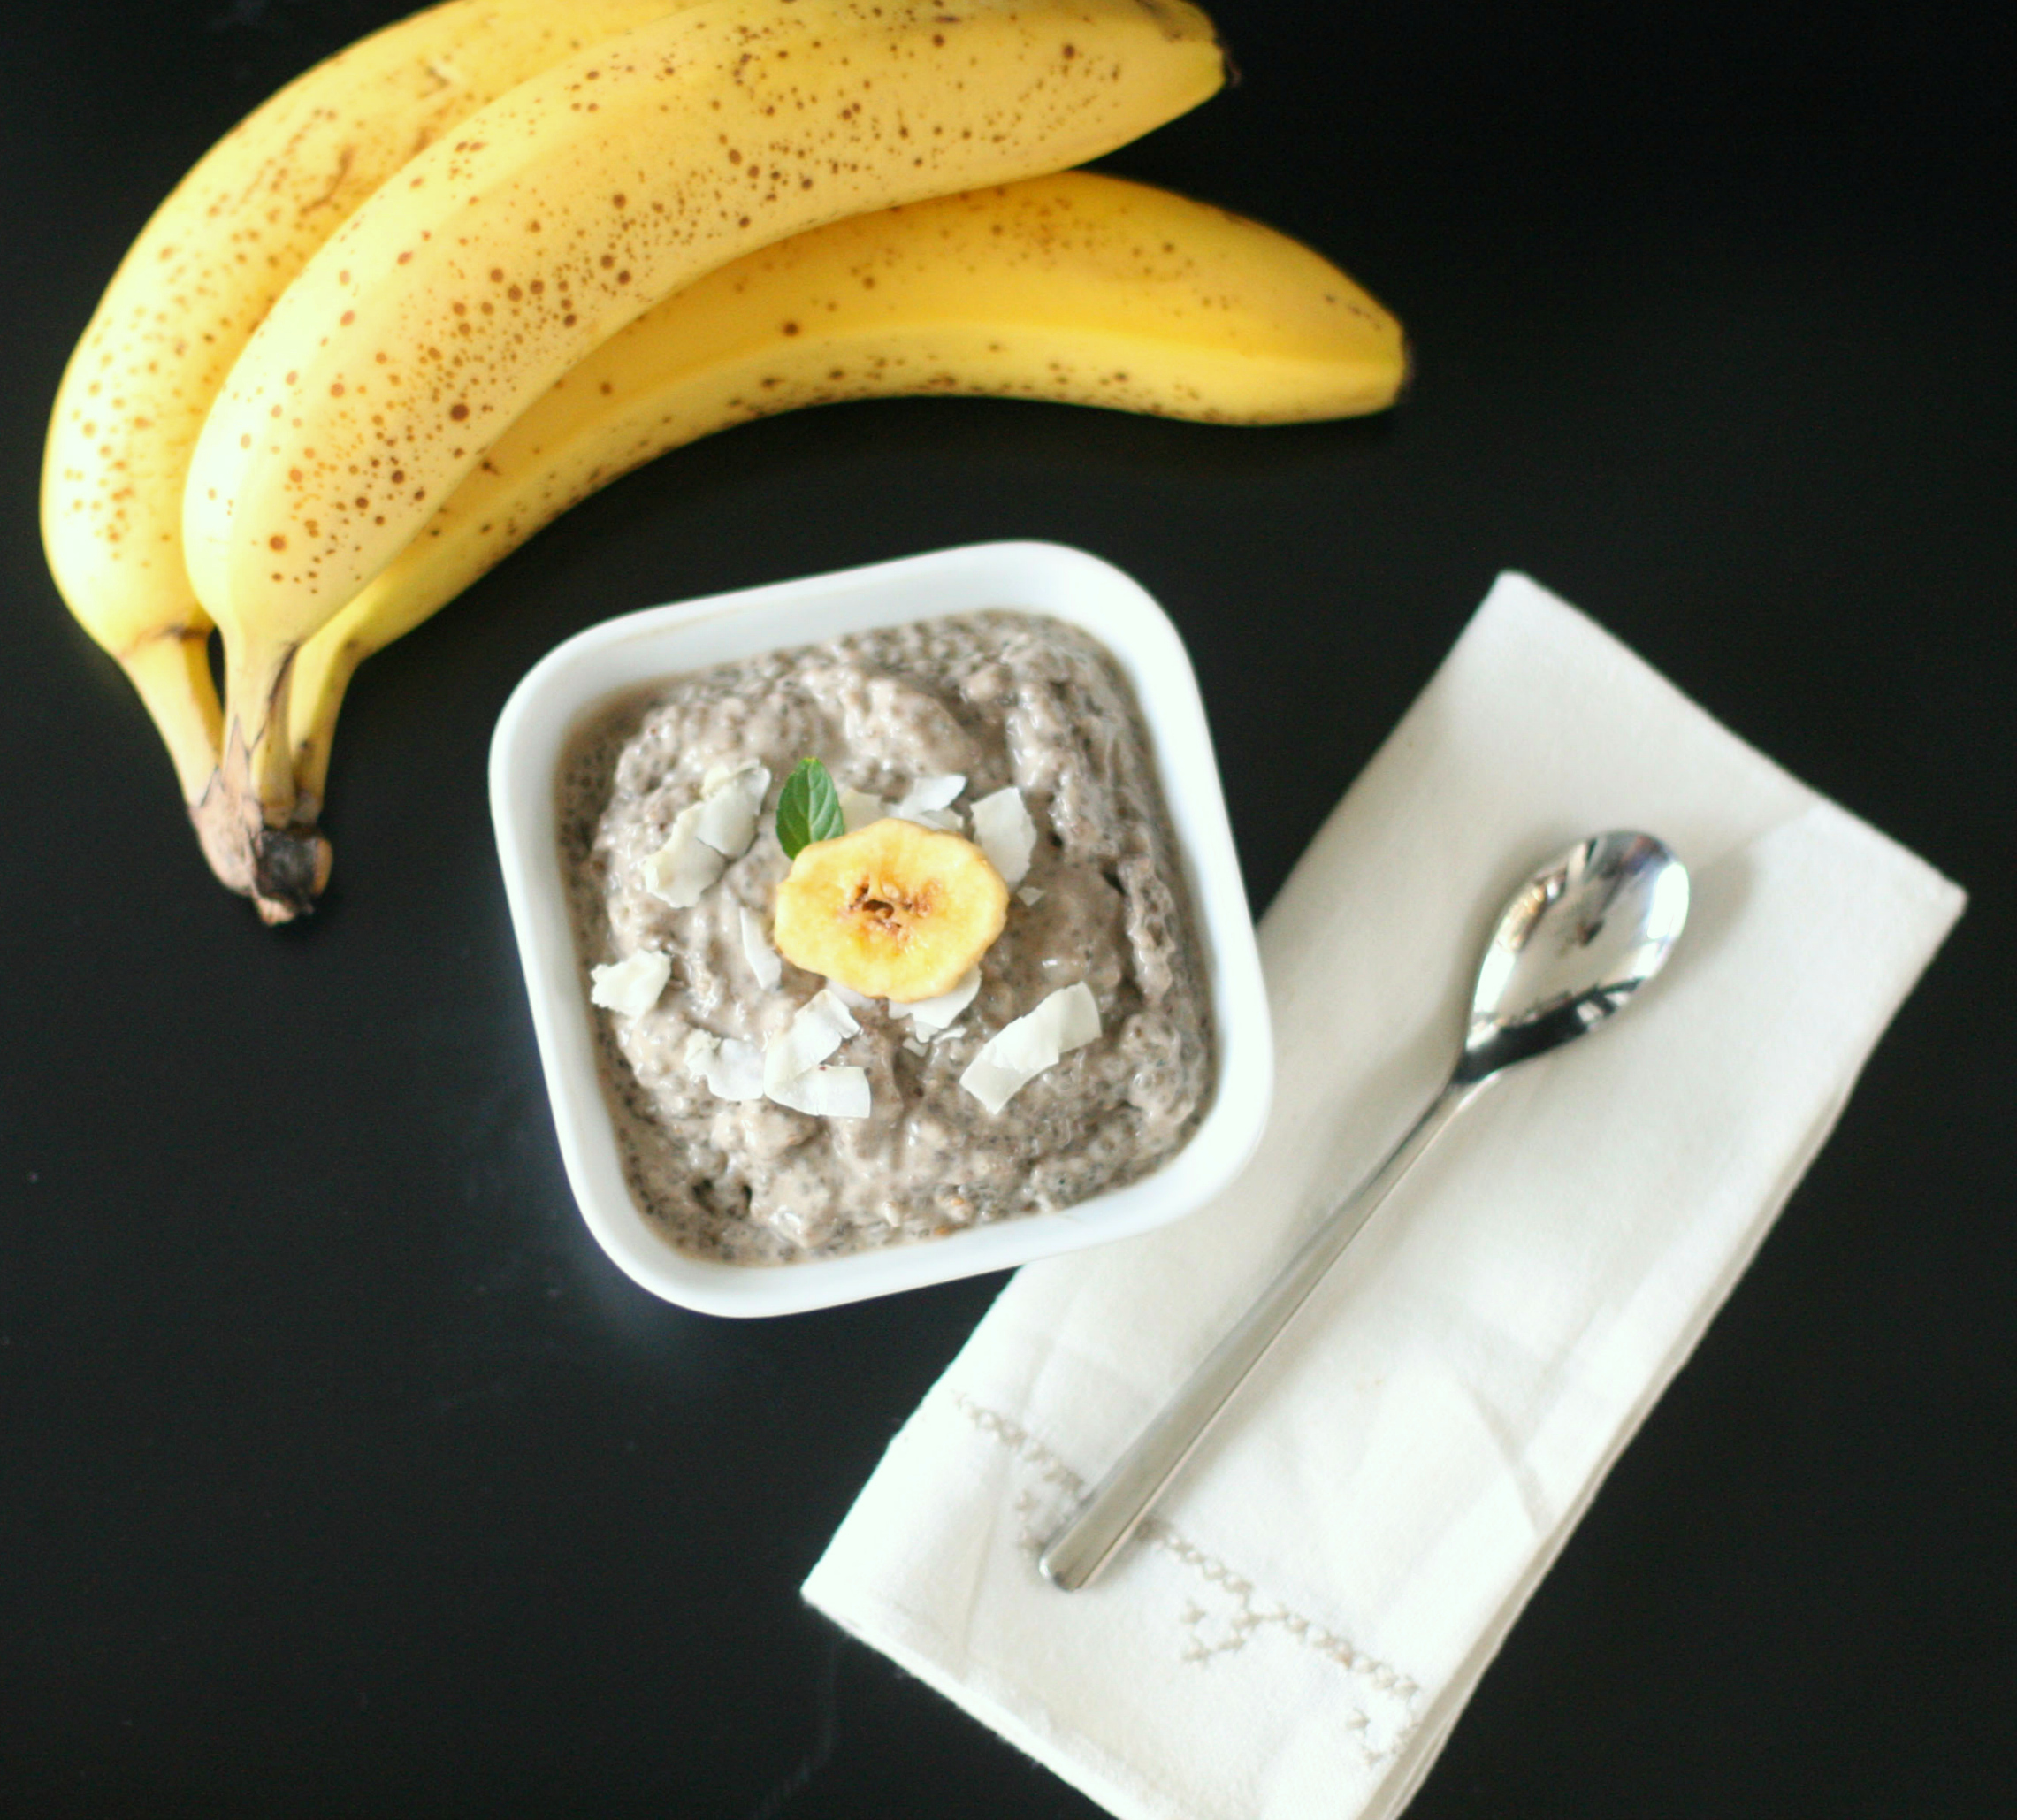 Produce on Parade: Banana Coconut Cream Chia Pudding with Cardamom